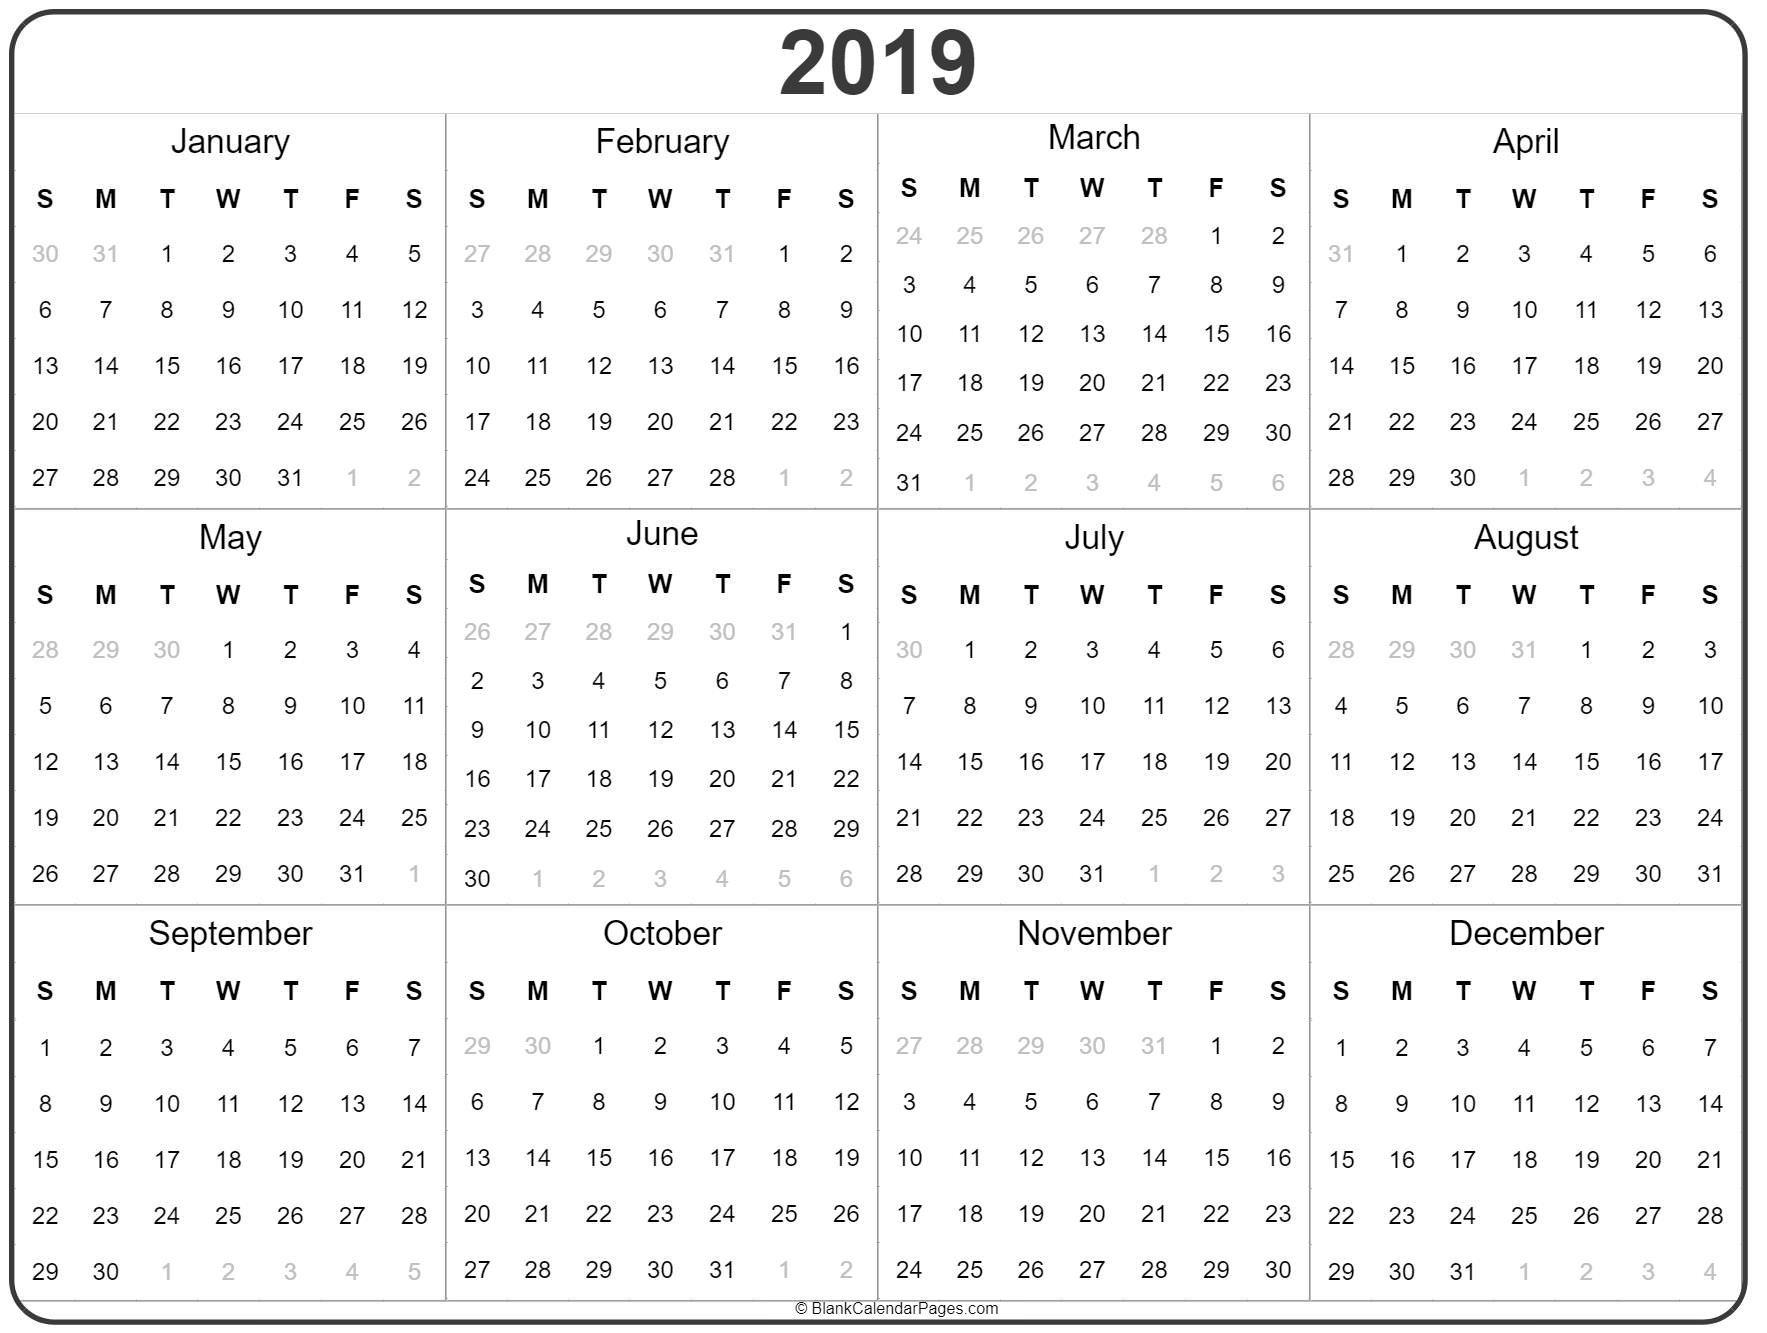 2019 Year Calendar | Yearly Printable Calendar Calendar 2019 Year